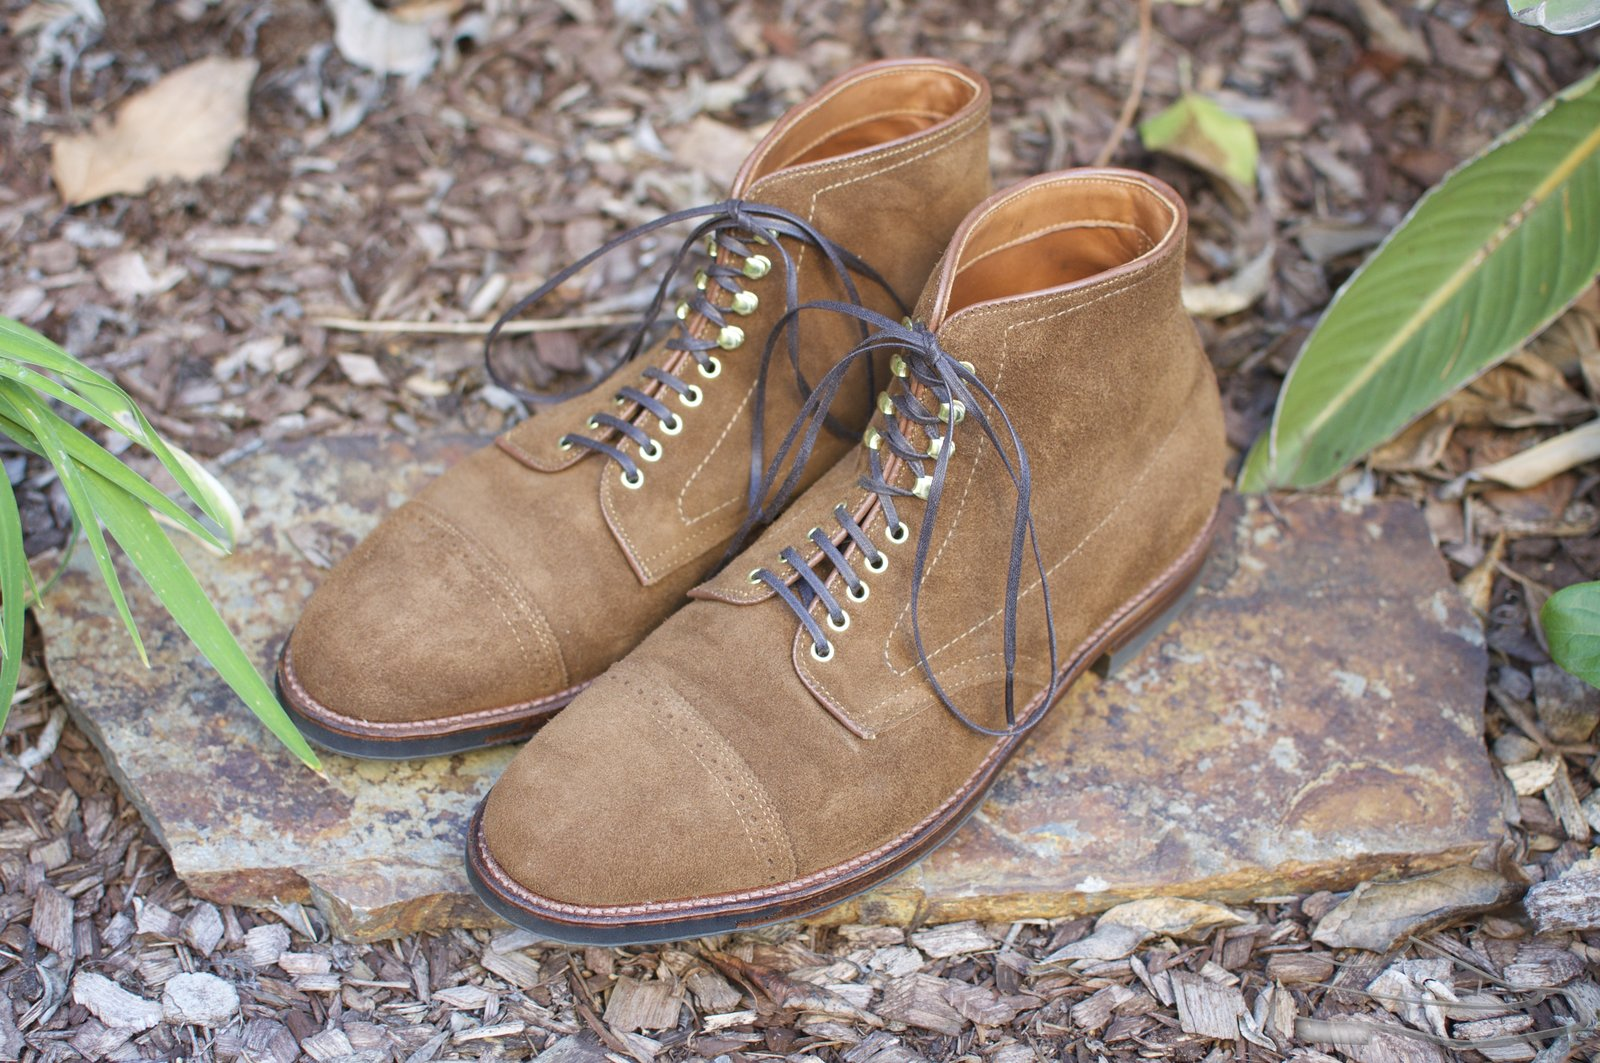 Alden Snuff Suede PCT Boots - 2021-04-30 - 1.jpg